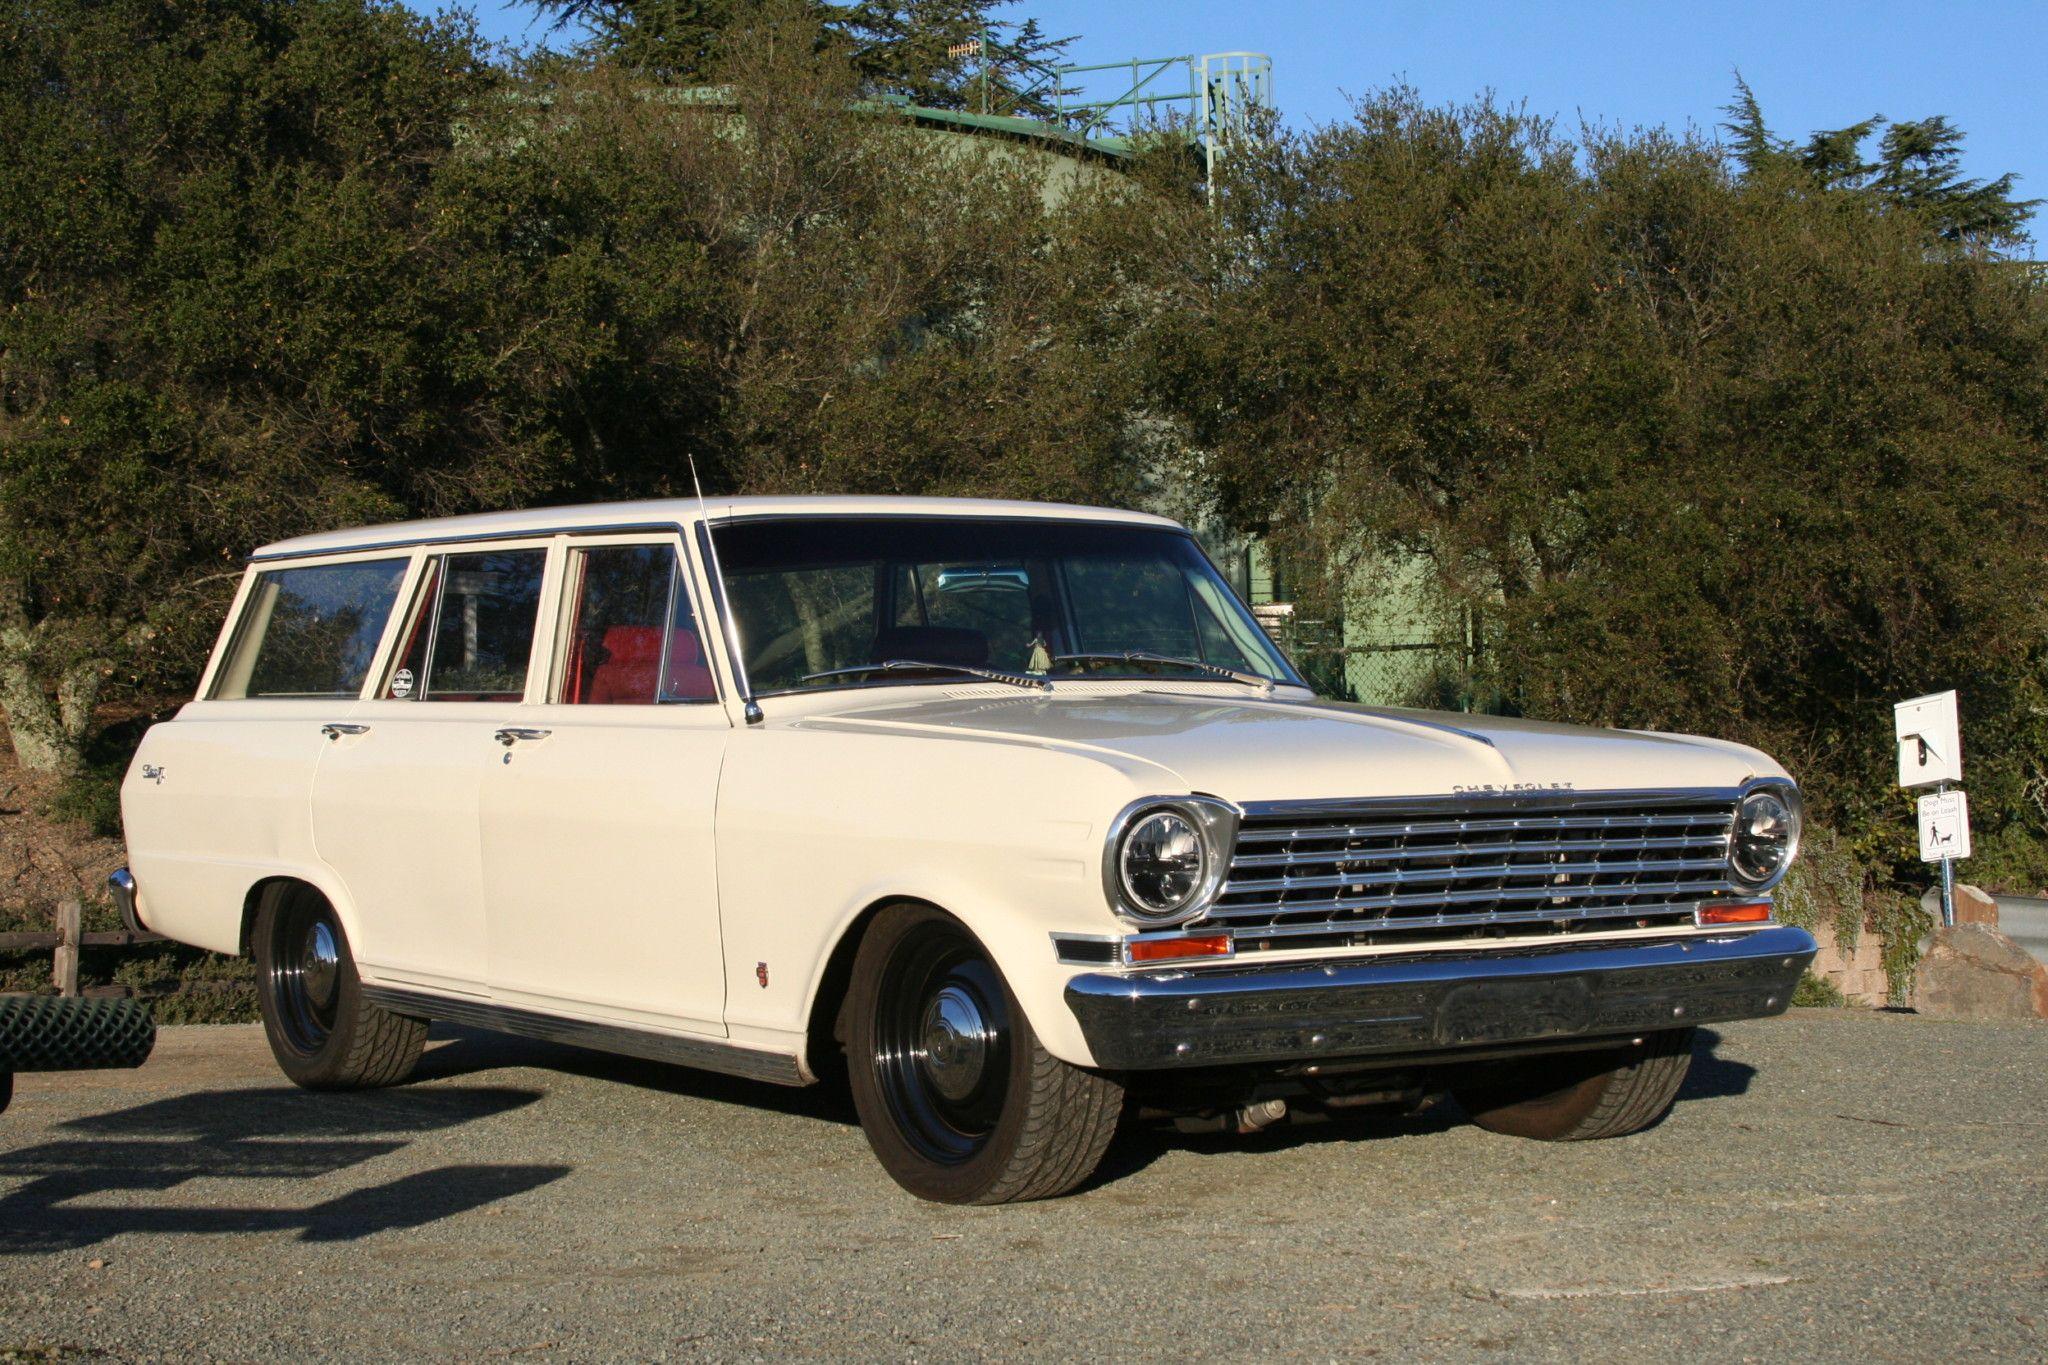 Ls1 Powered 1963 Chevrolet Nova Wagon In 2020 Chevrolet Nova